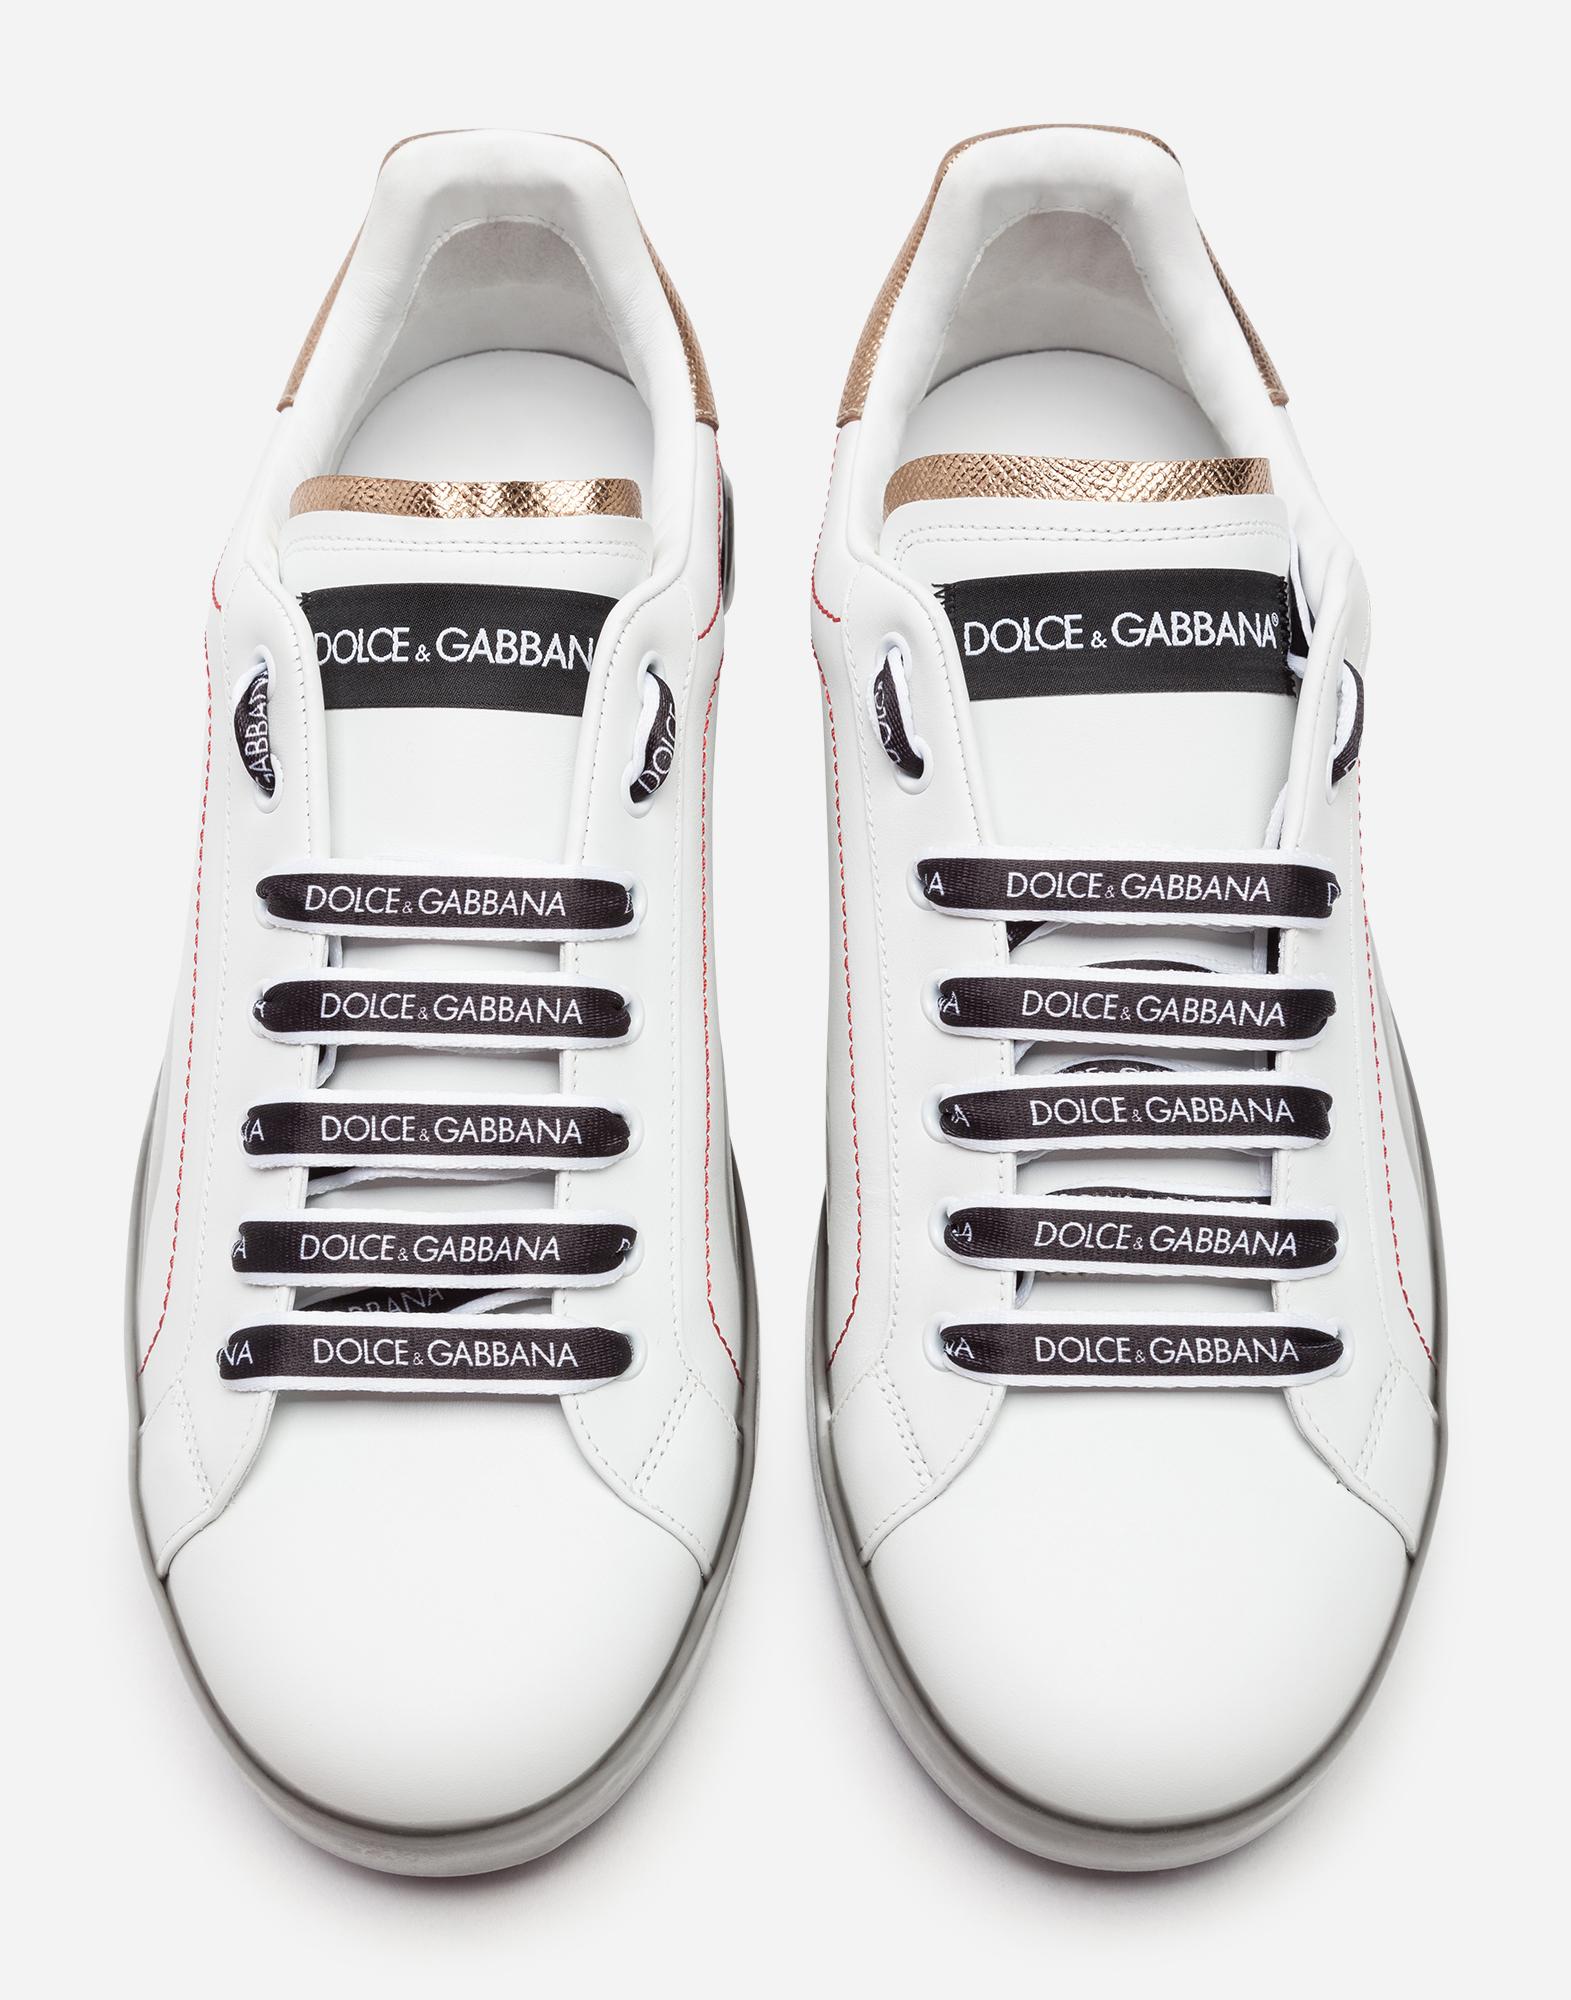 Dolce & Gabbana PORTOFINO MELT SNEAKERS IN NAPPA CALFSKIN